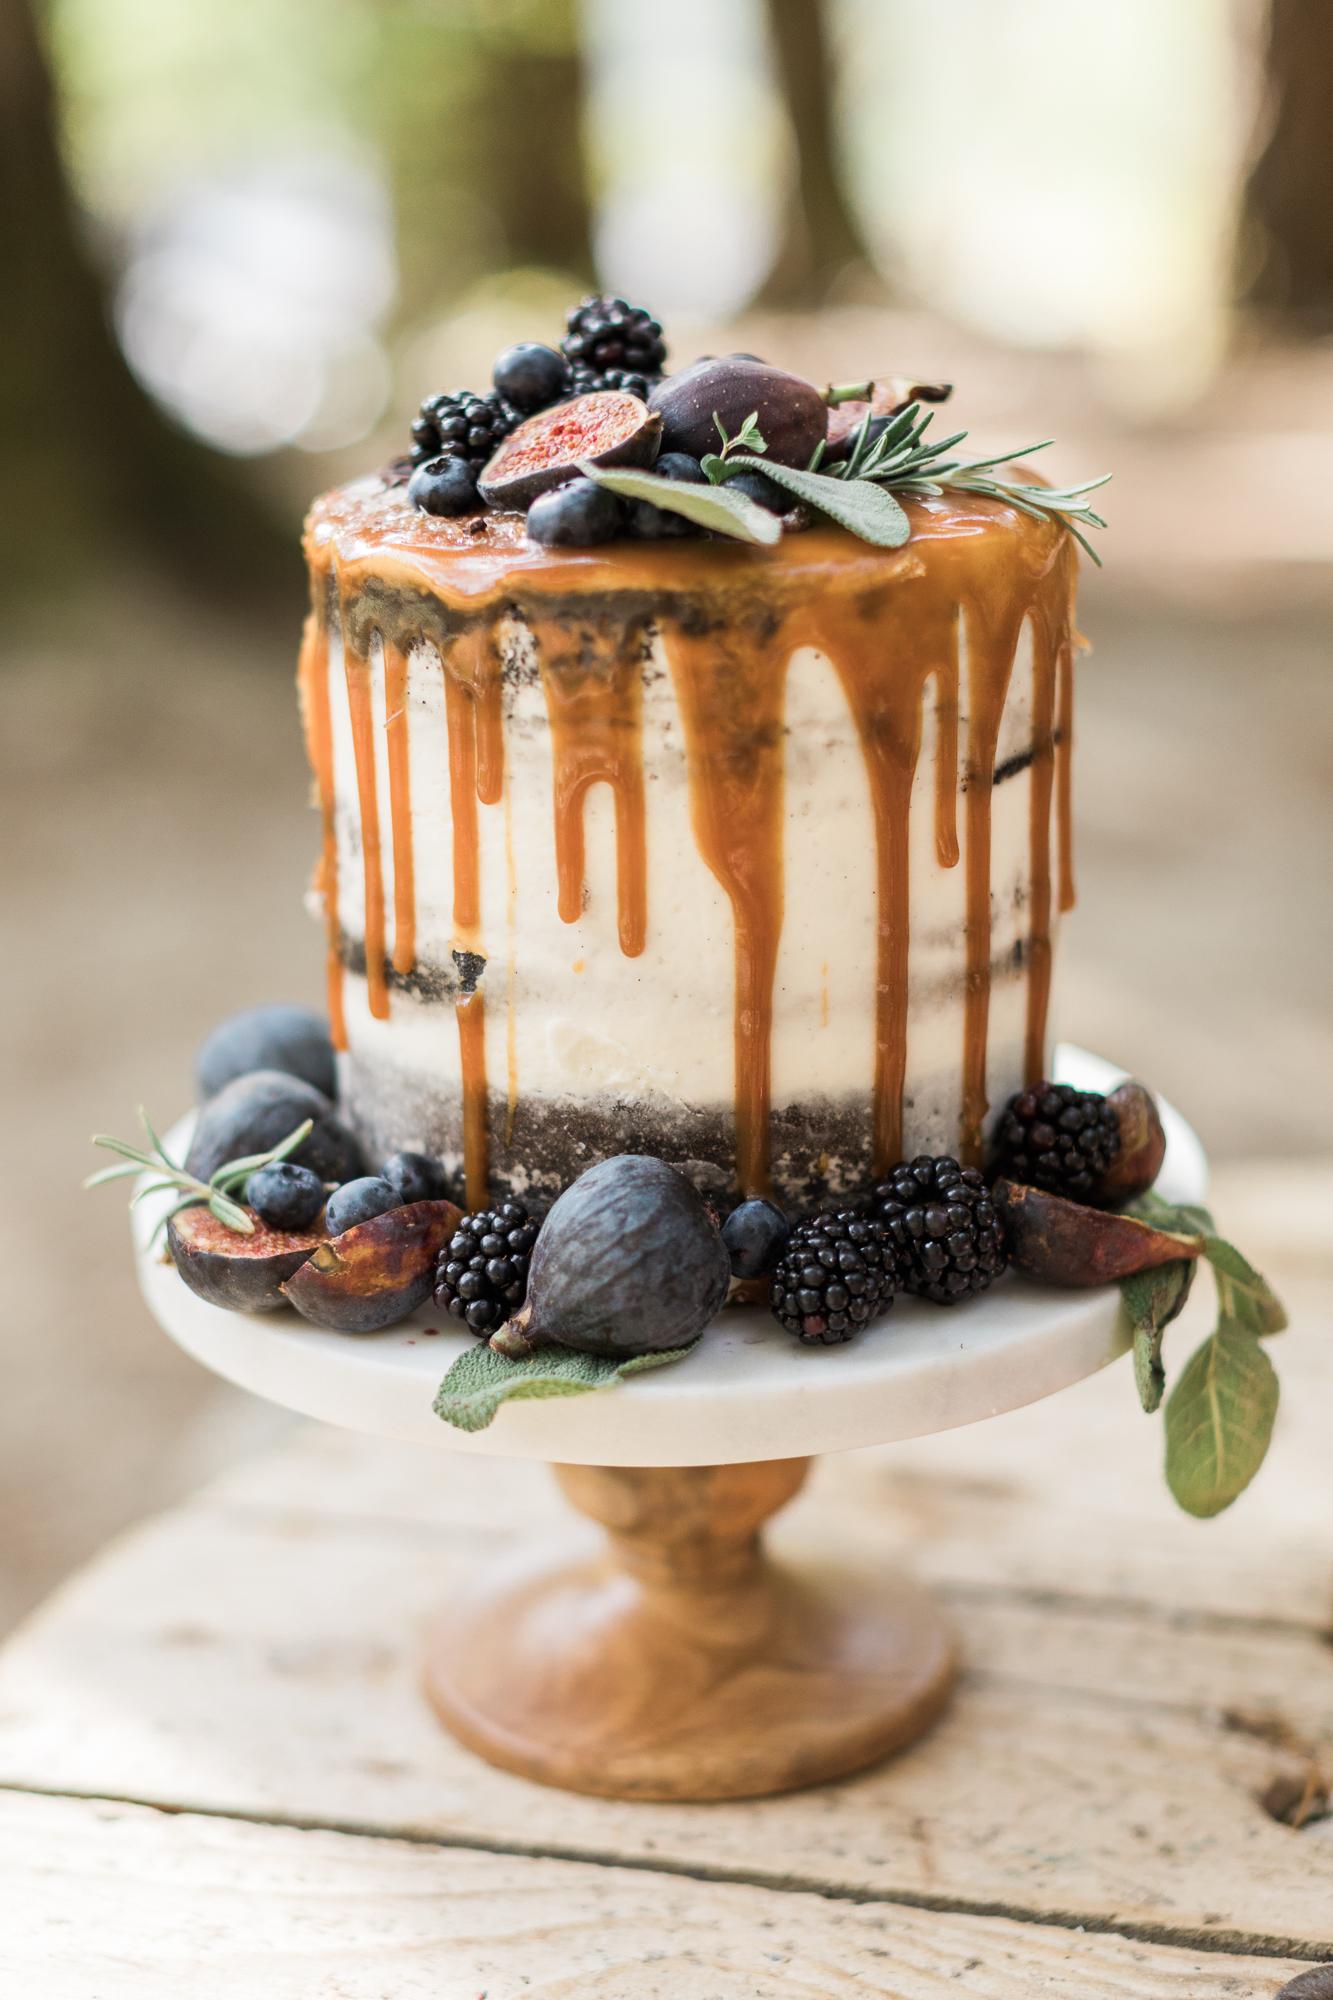 Salted Caramel Translucent Cake:  Eat More Cake by Candice  Image:  Joanna Monger